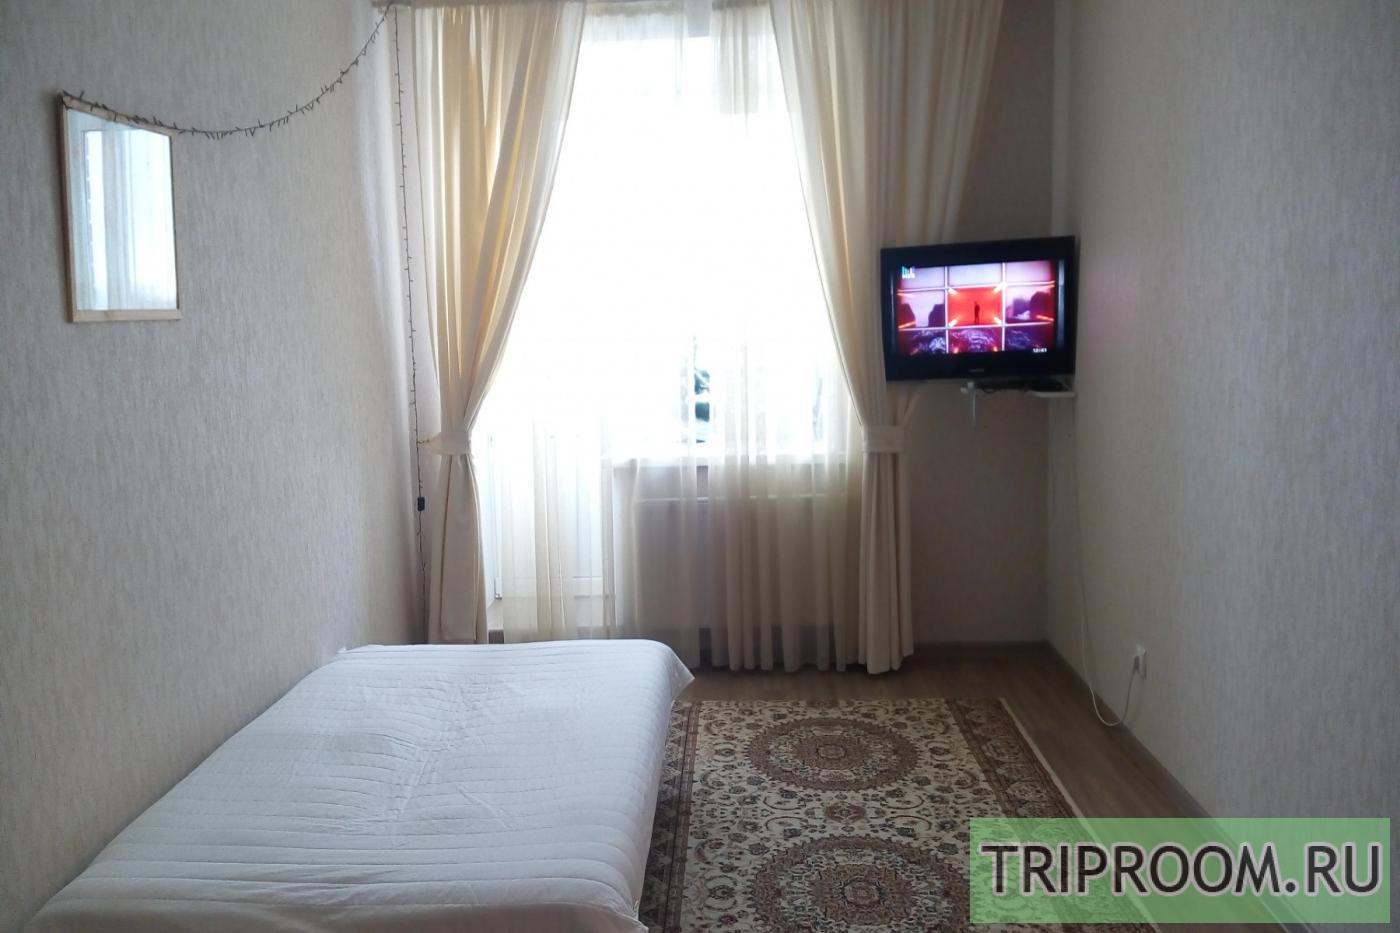 1-комнатная квартира посуточно (вариант № 11254), ул. Рауиса Гареева улица, фото № 3